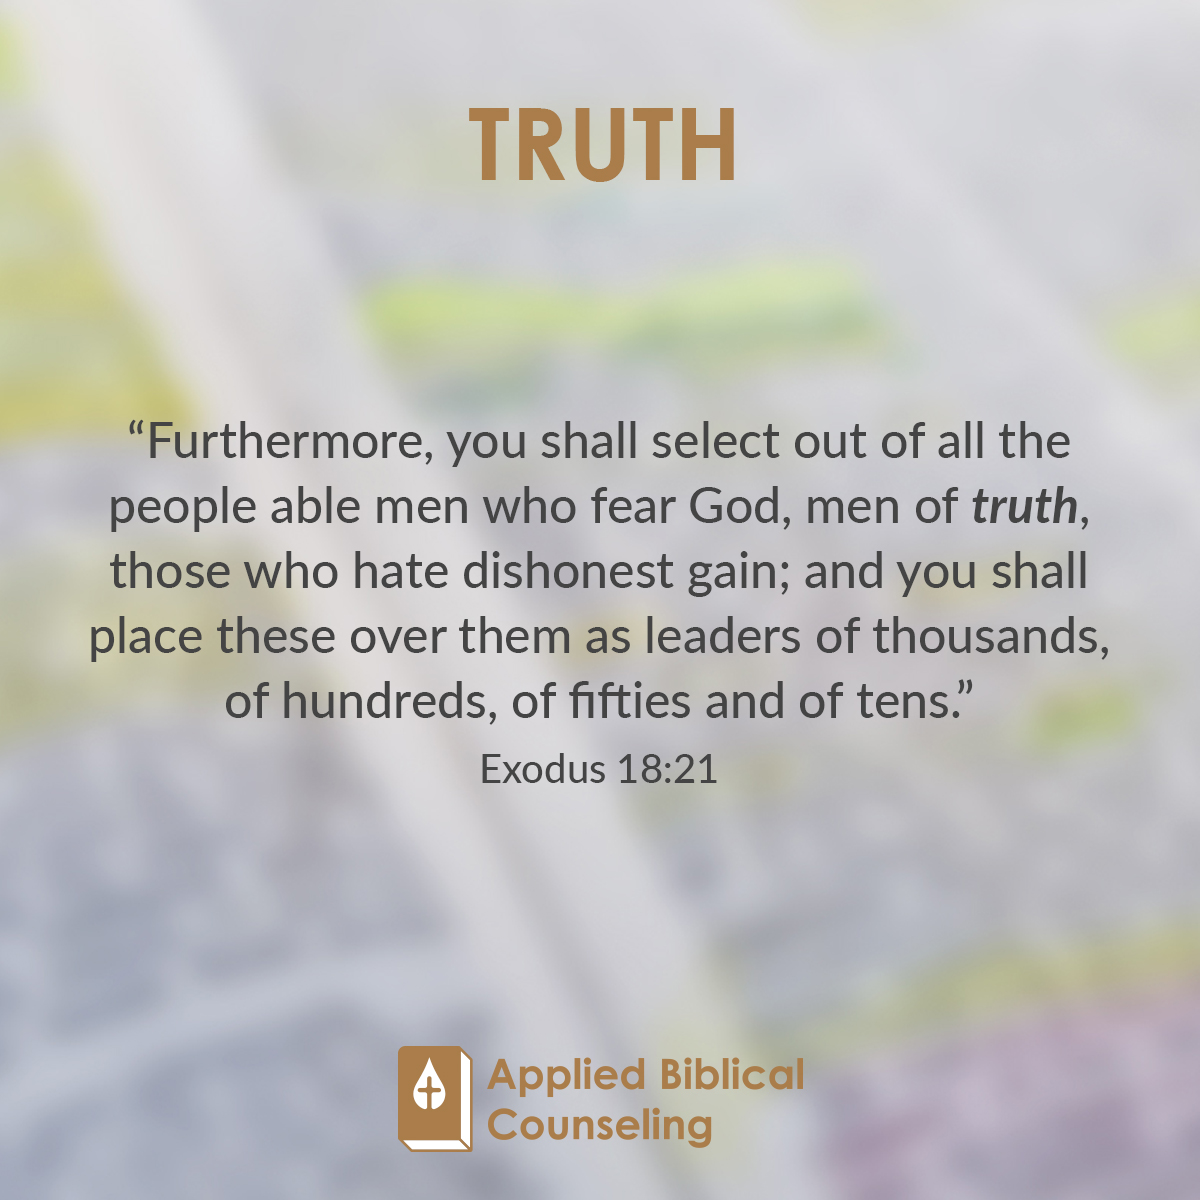 ABC_Facebook-w1-truth-5